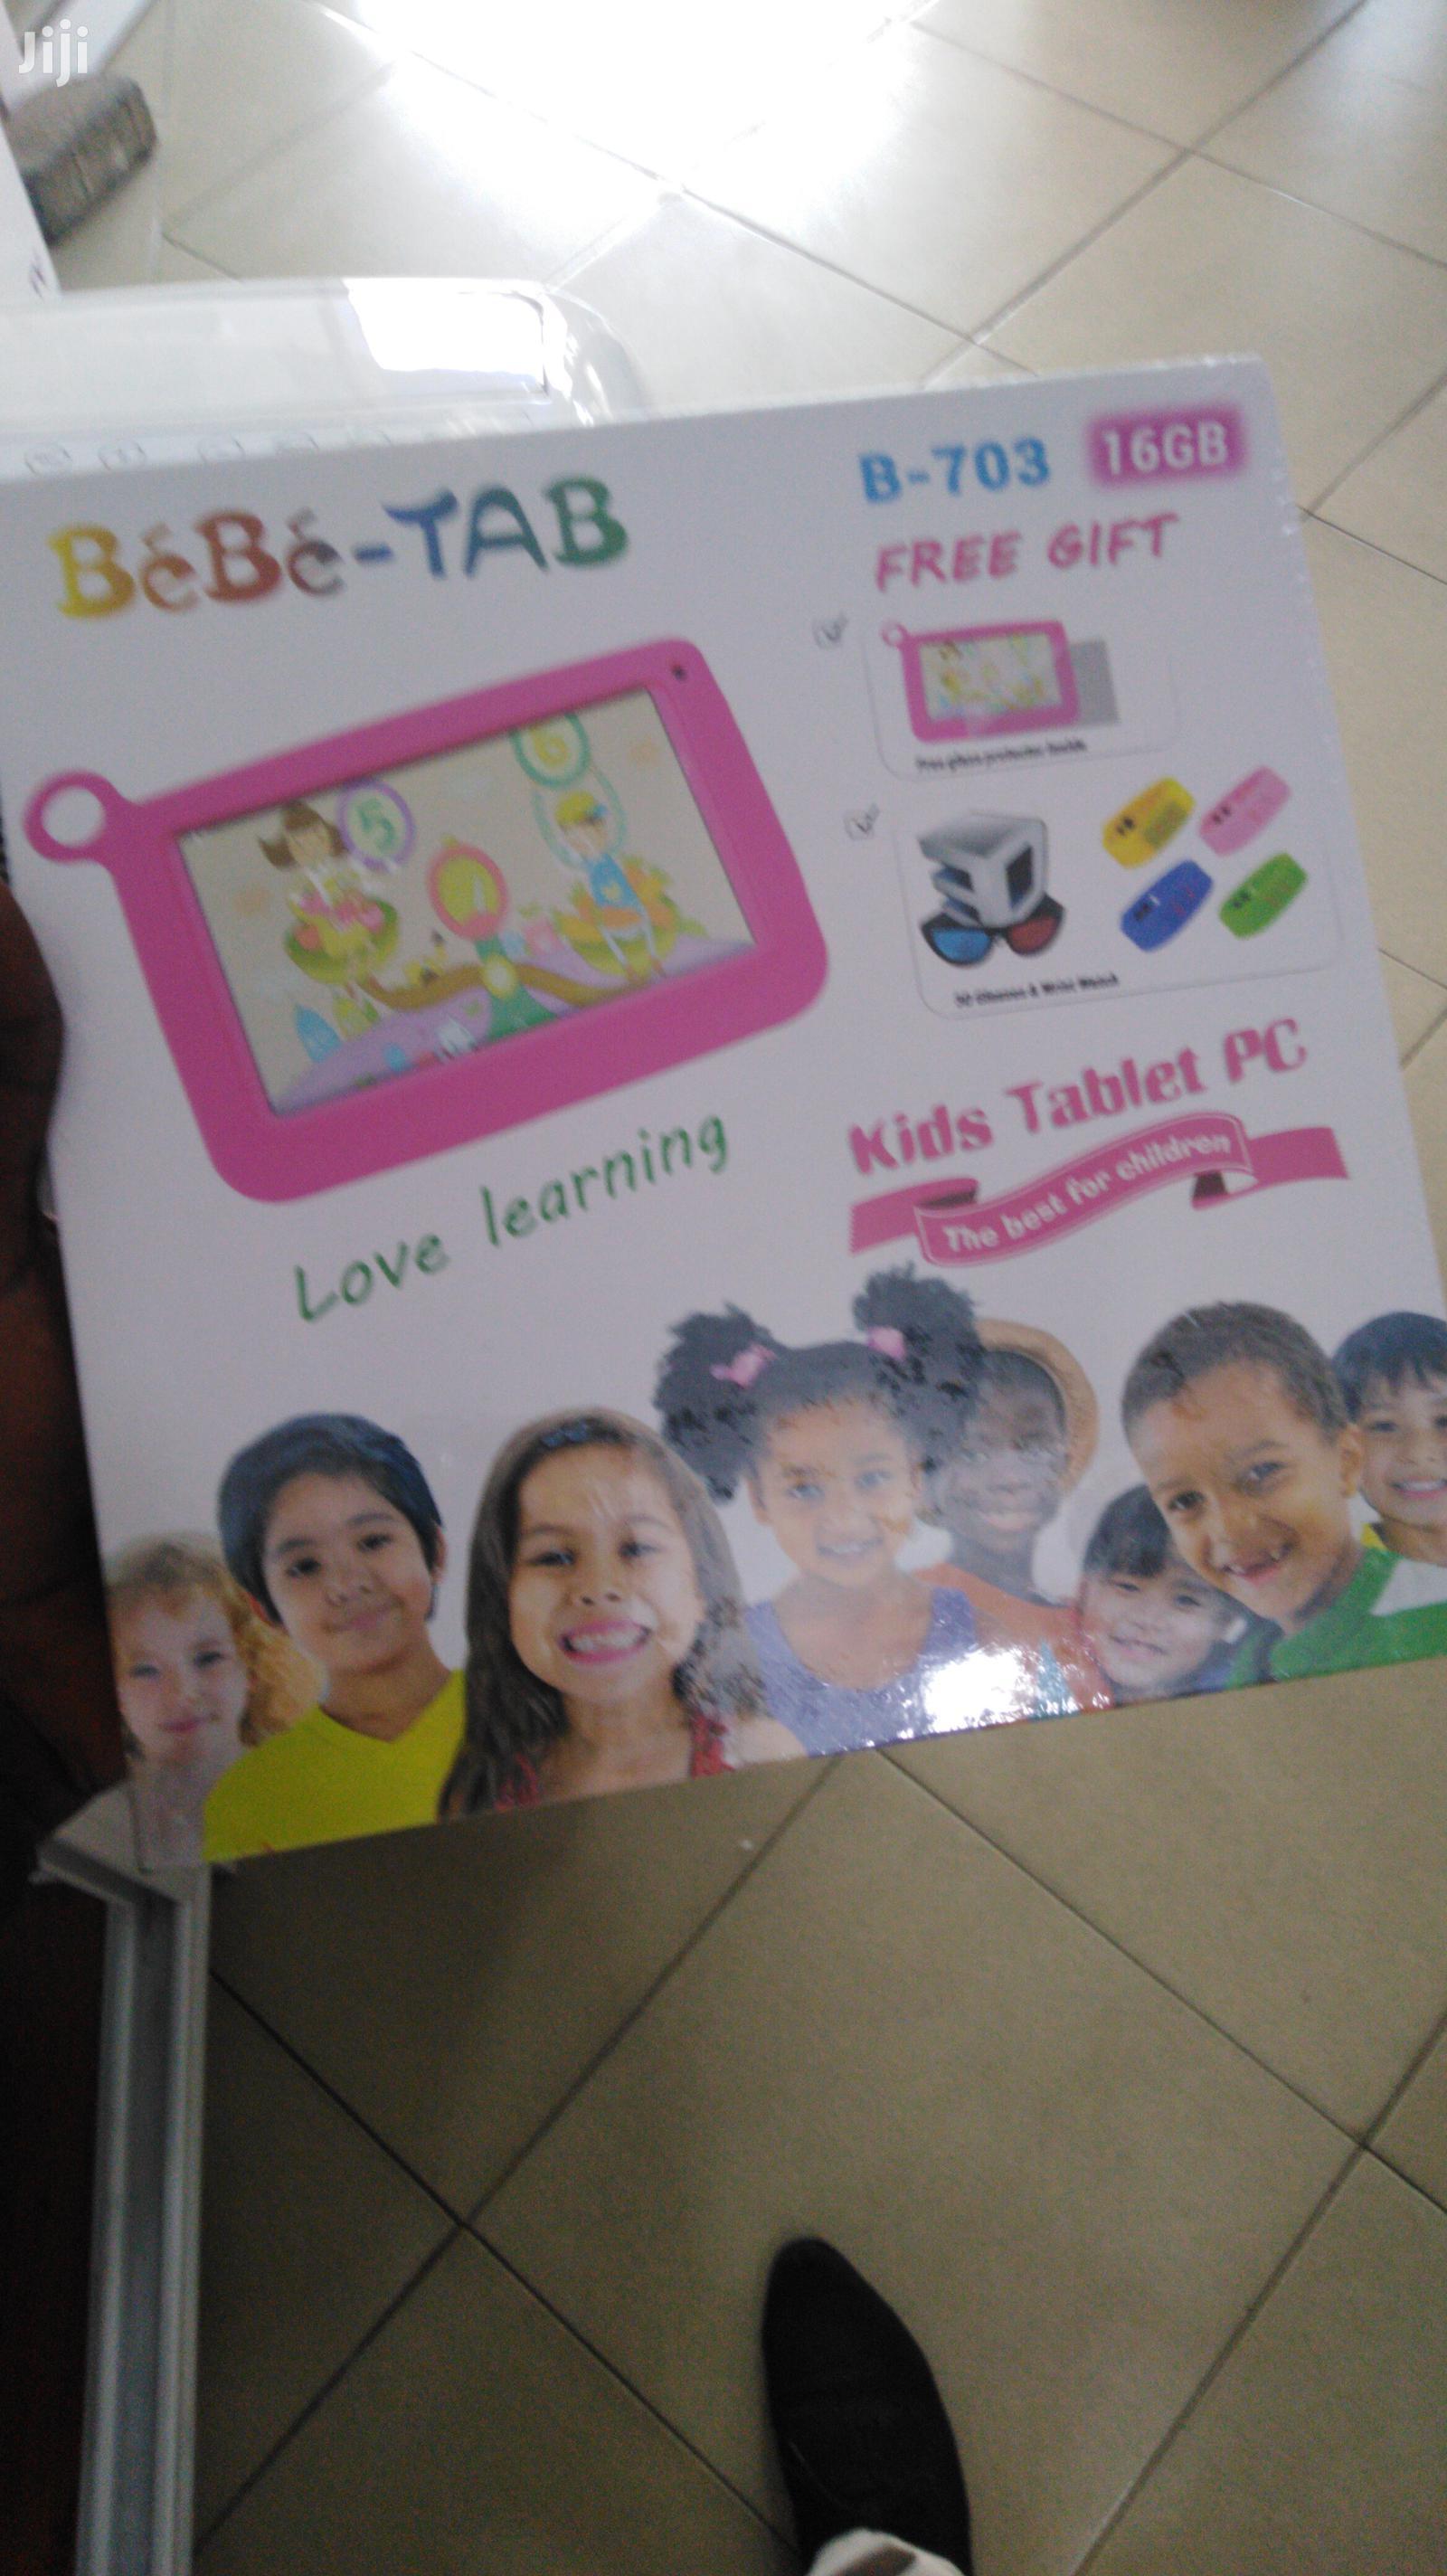 Bebe-Tab B703 Kids Educational Tablets